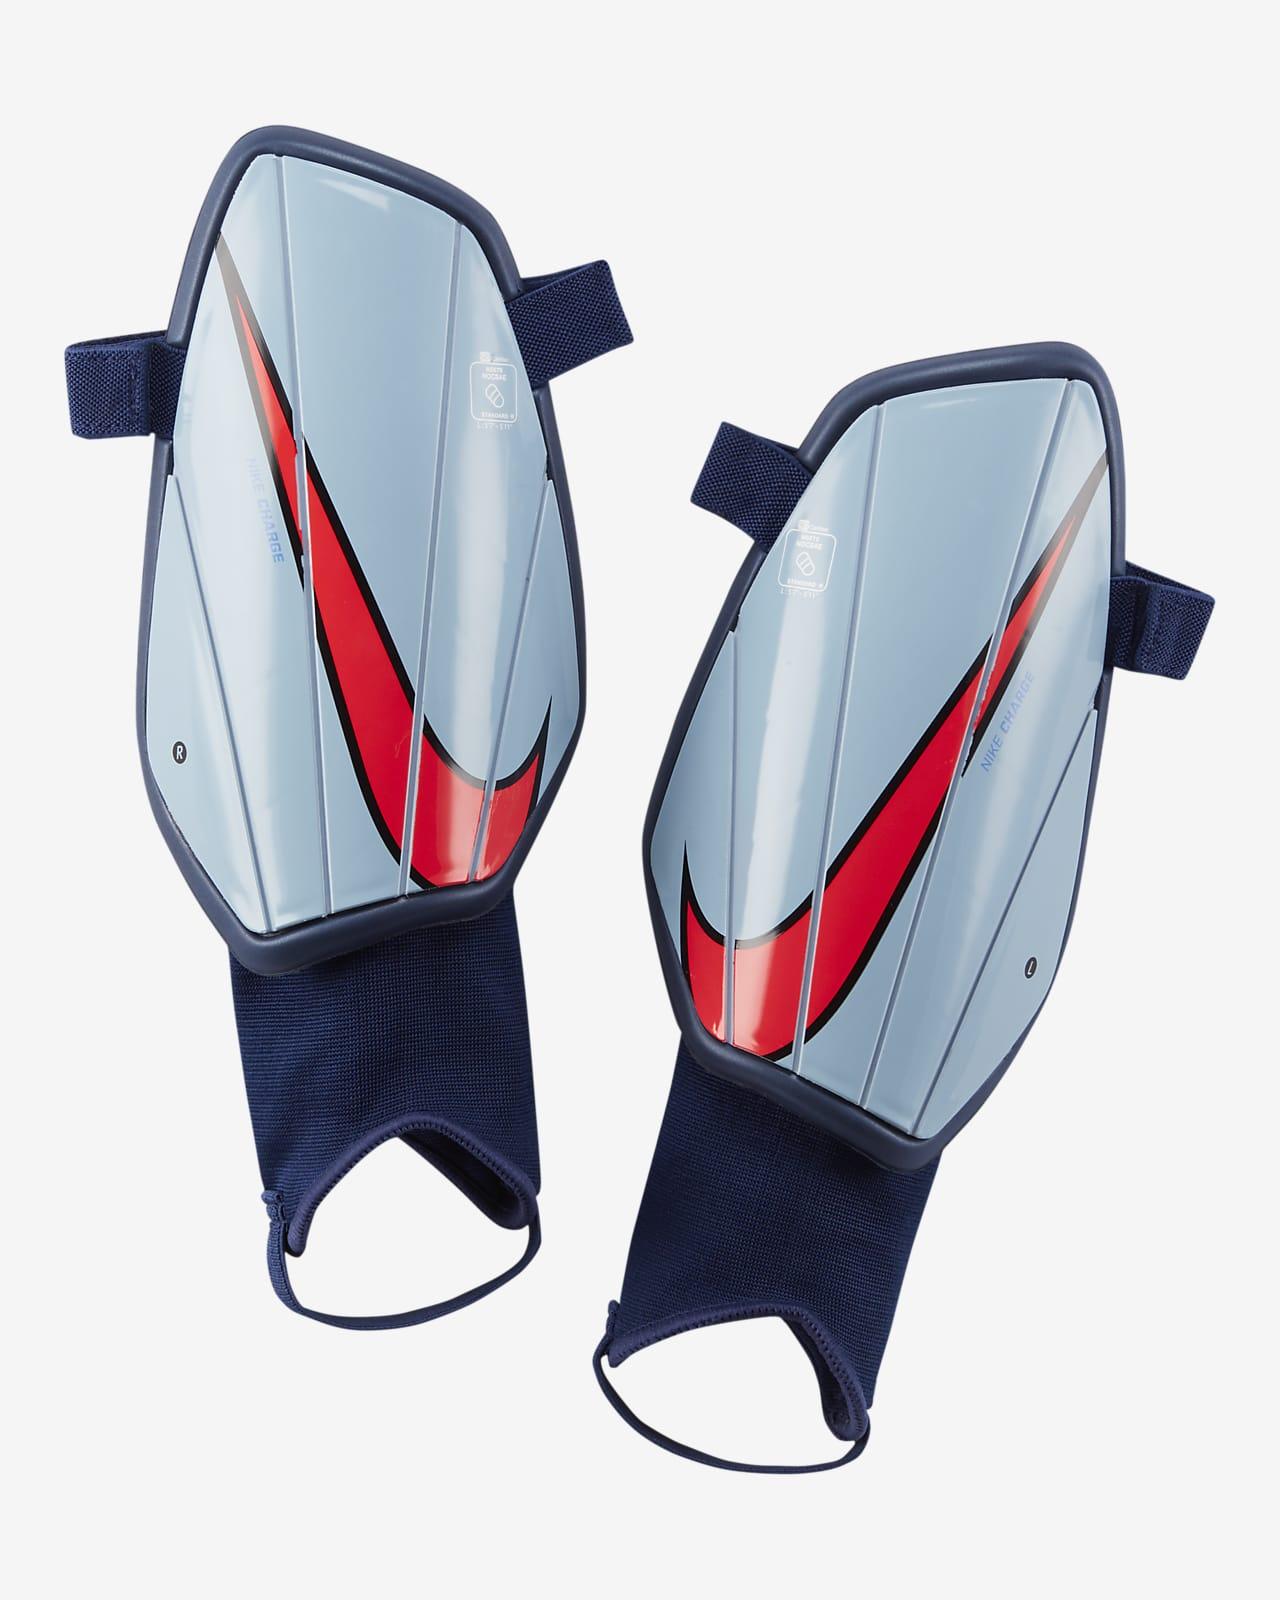 Nike Charge fotballeggskinn